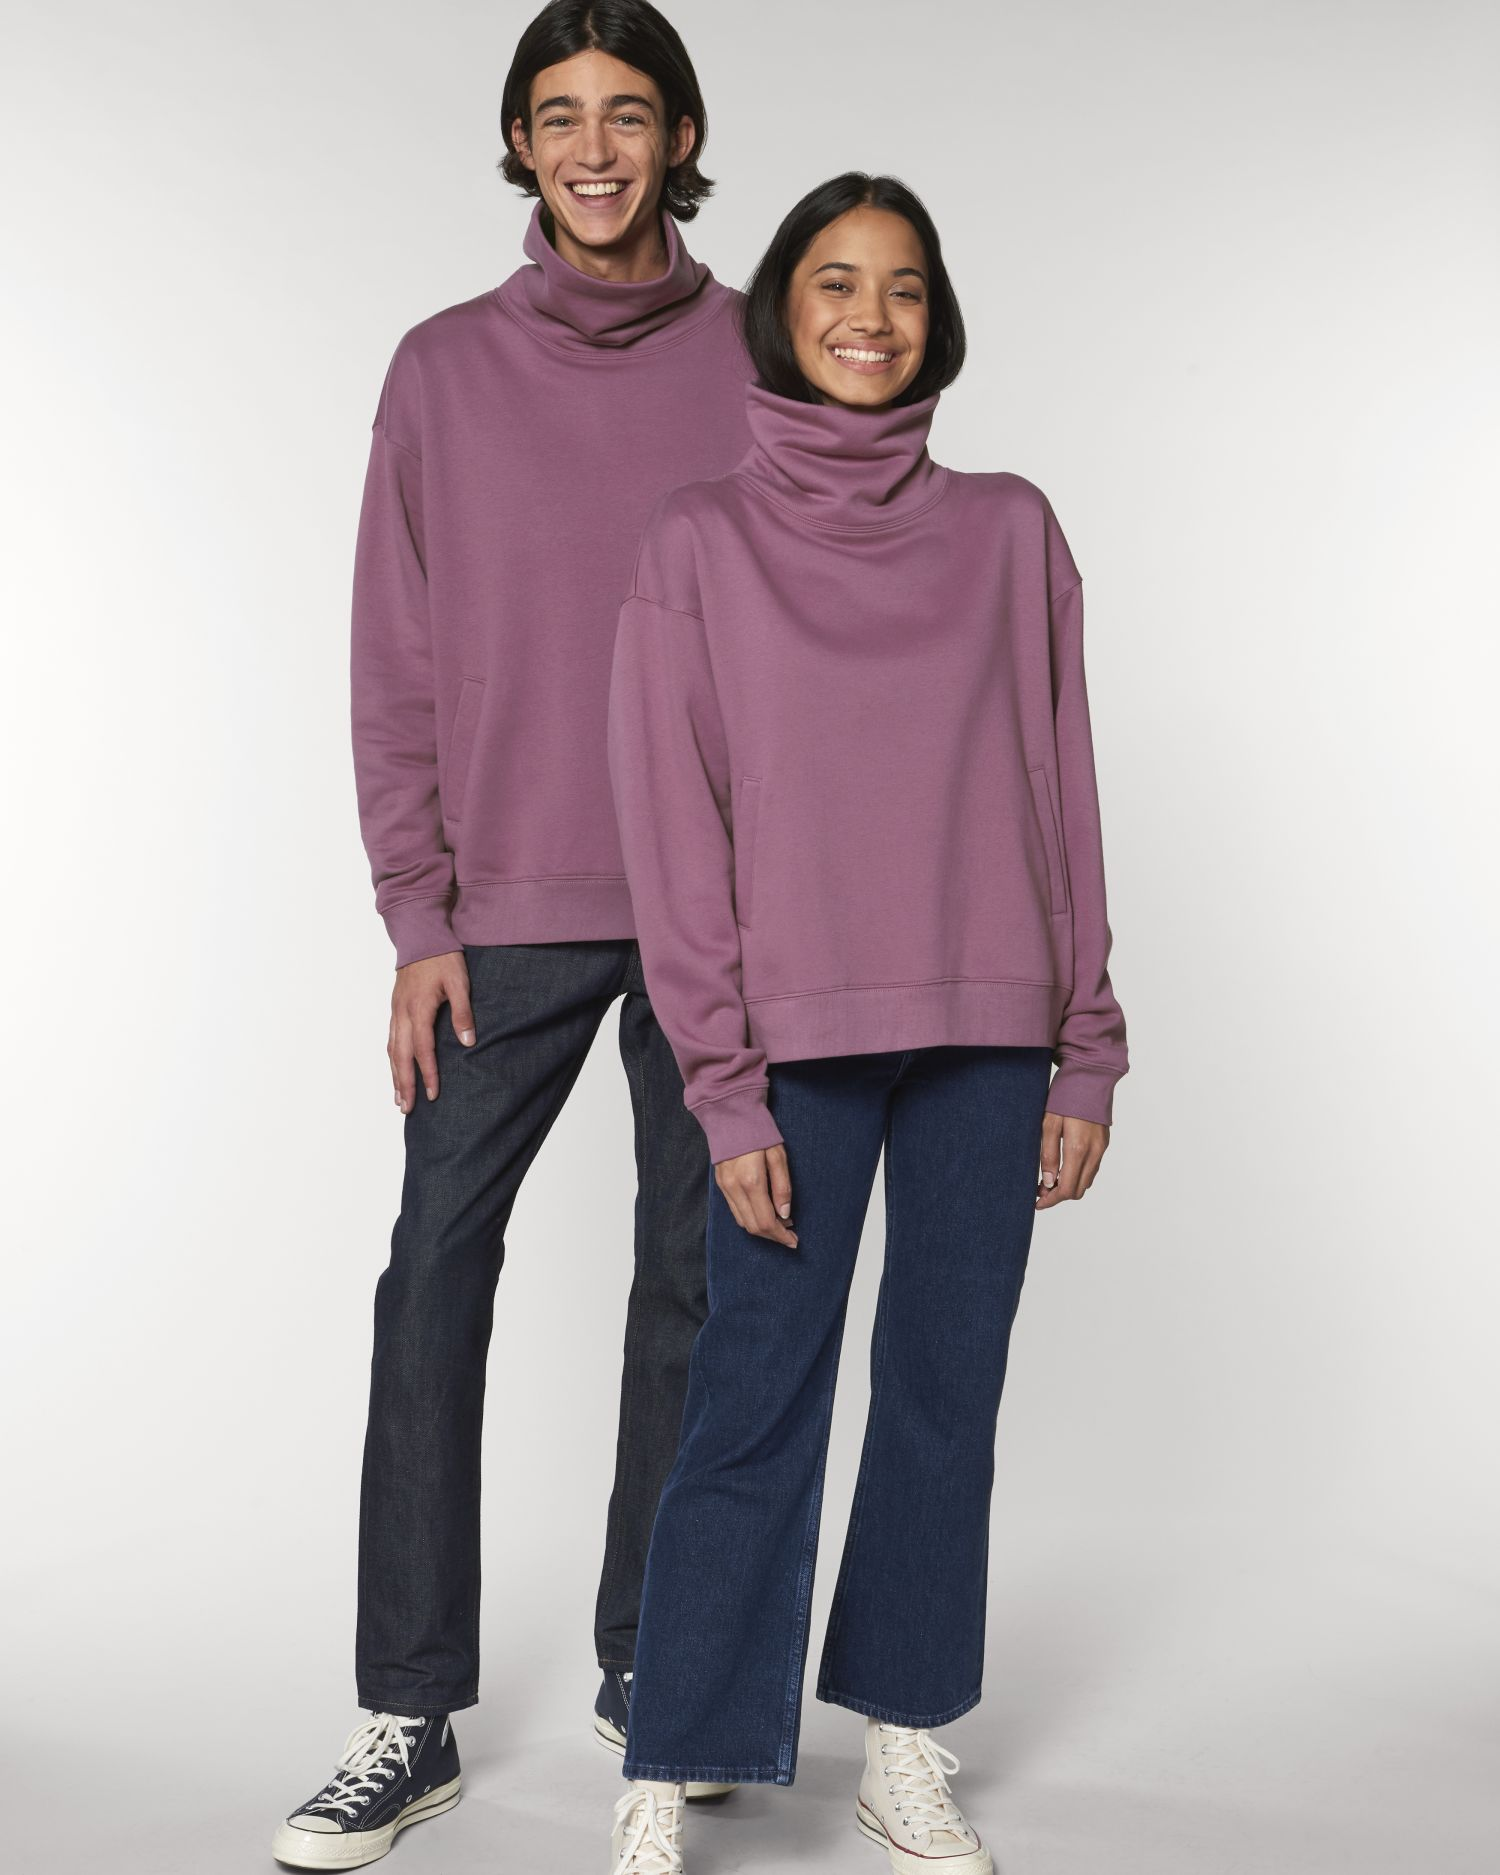 Strider - Le sweatshirt col montant unisexe